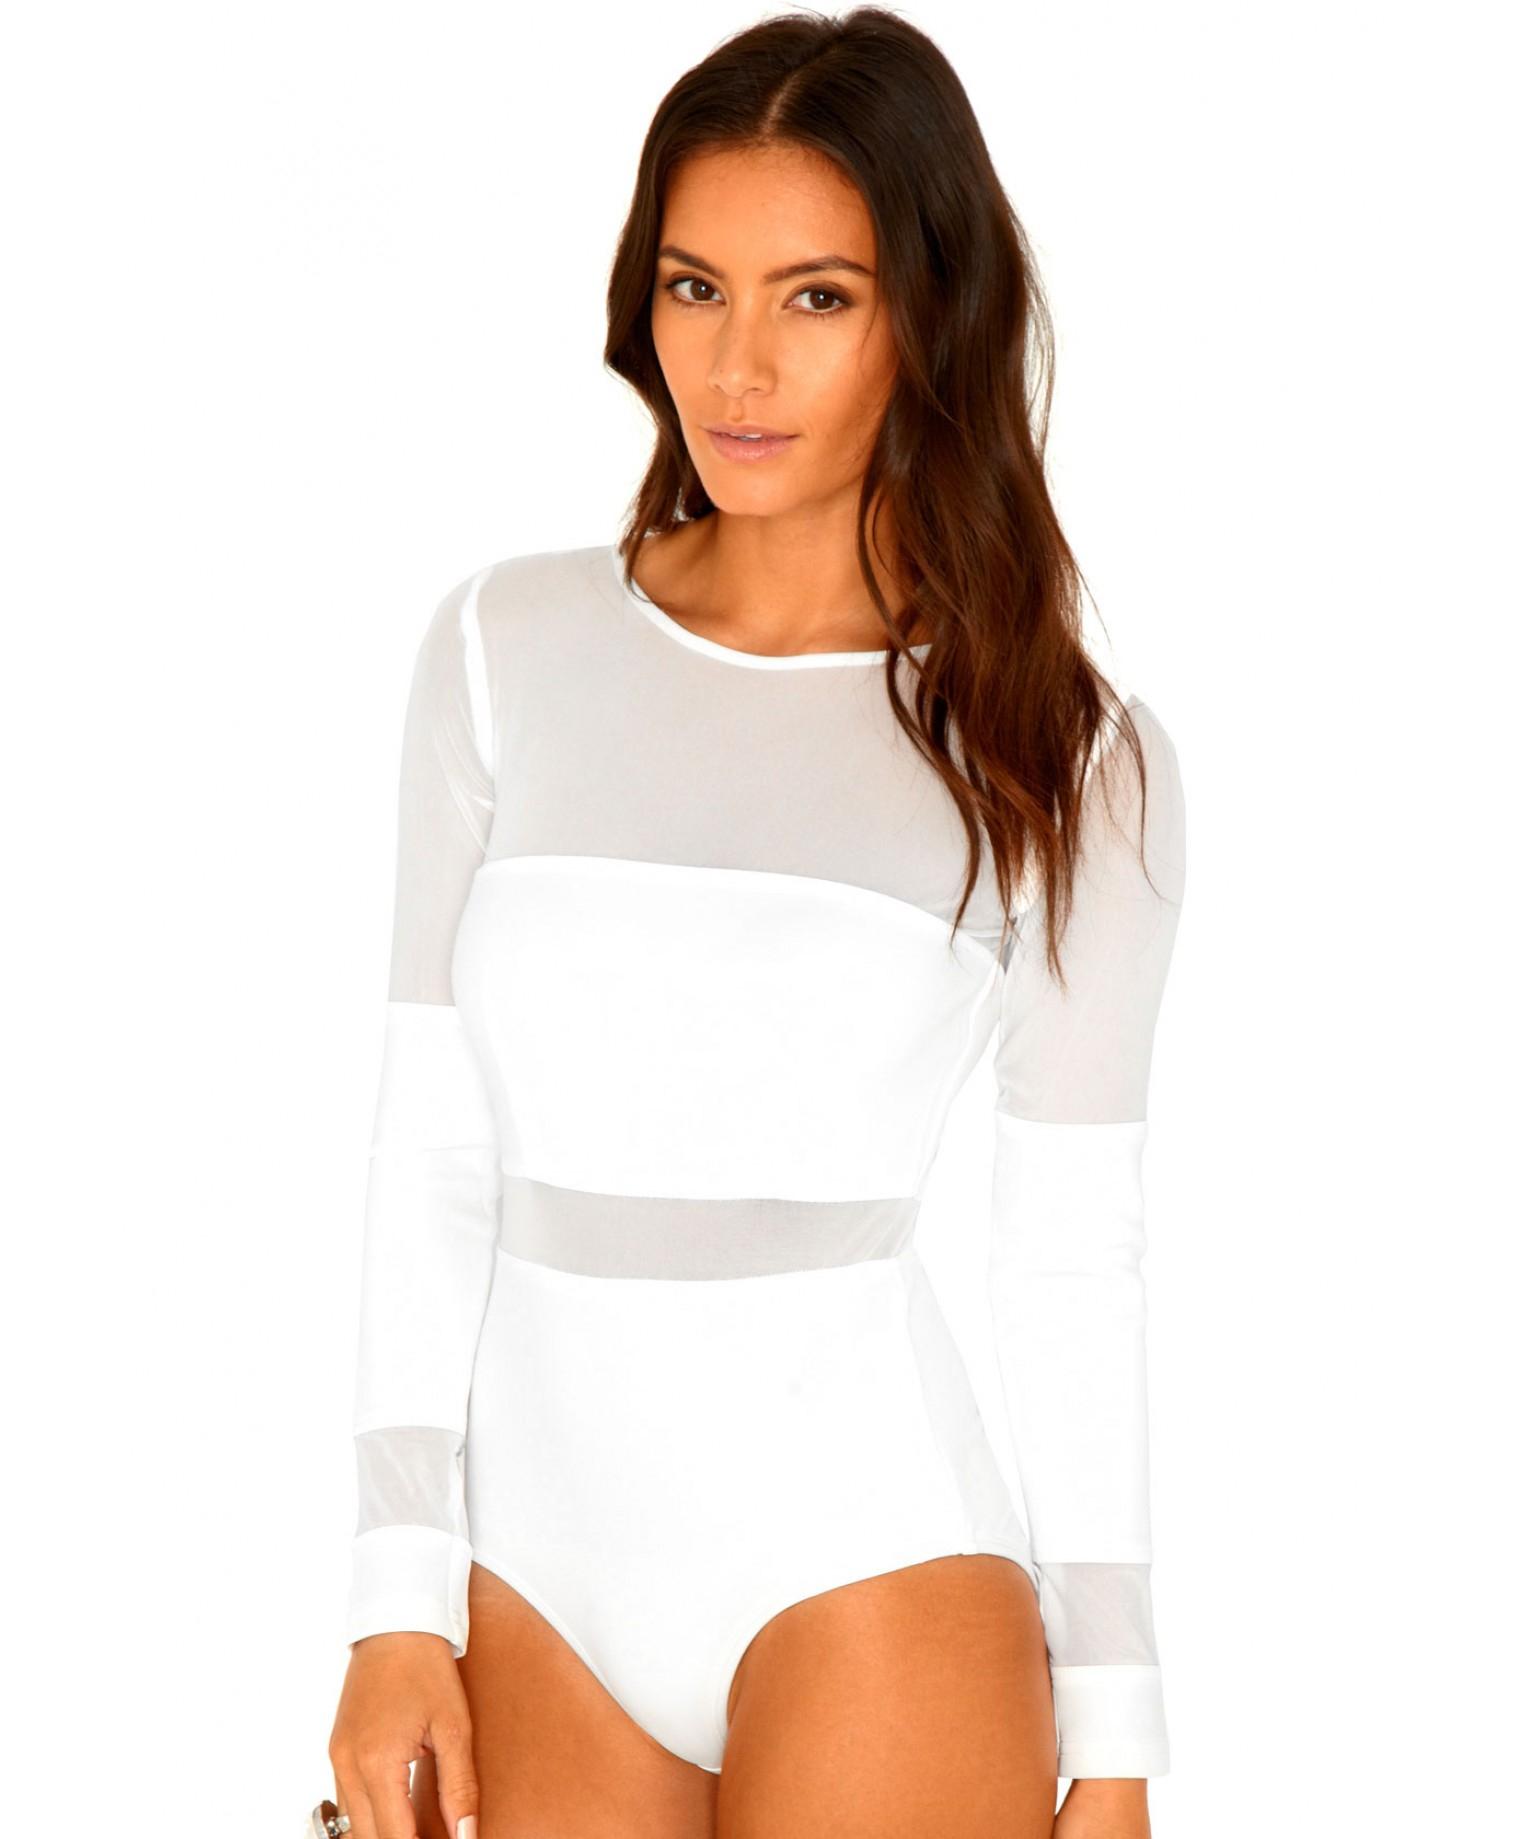 Lyst - Missguided Lorenza Mesh Panel Bodysuit in Cream in Natural ed45d9207